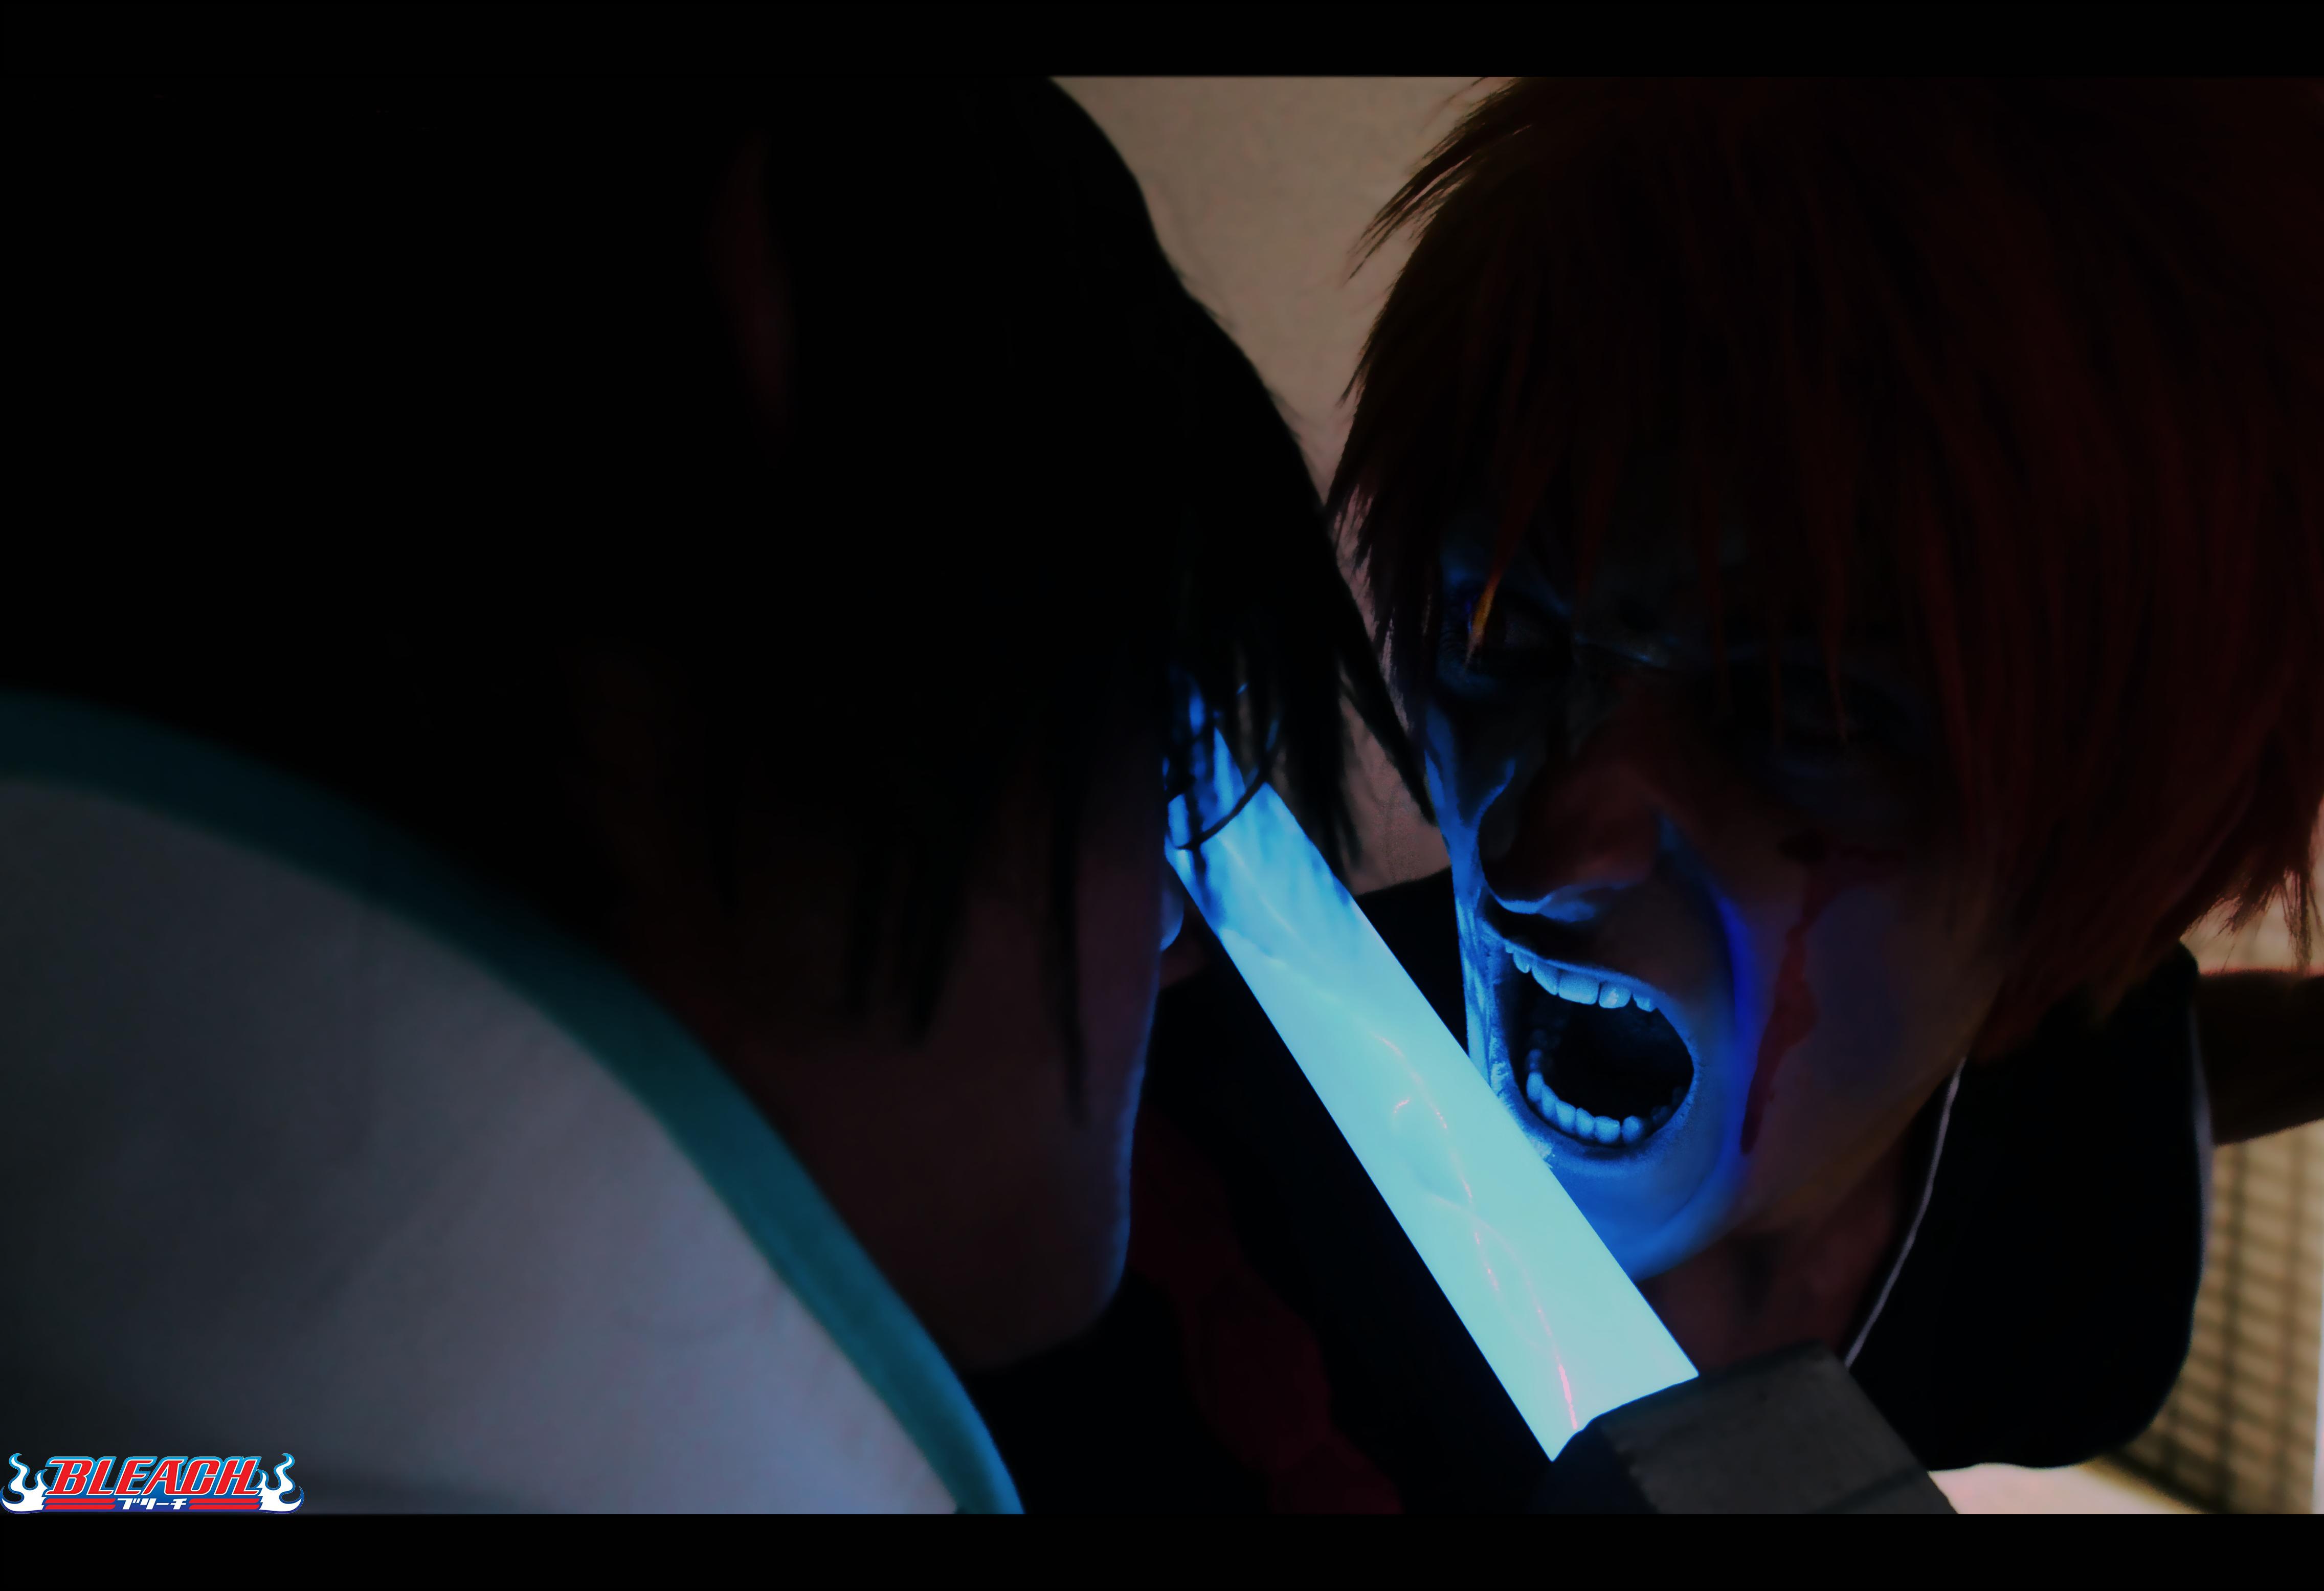 Bleach: Ishida Uryuu Cosplay (Killer Instinct ) by Schismism7